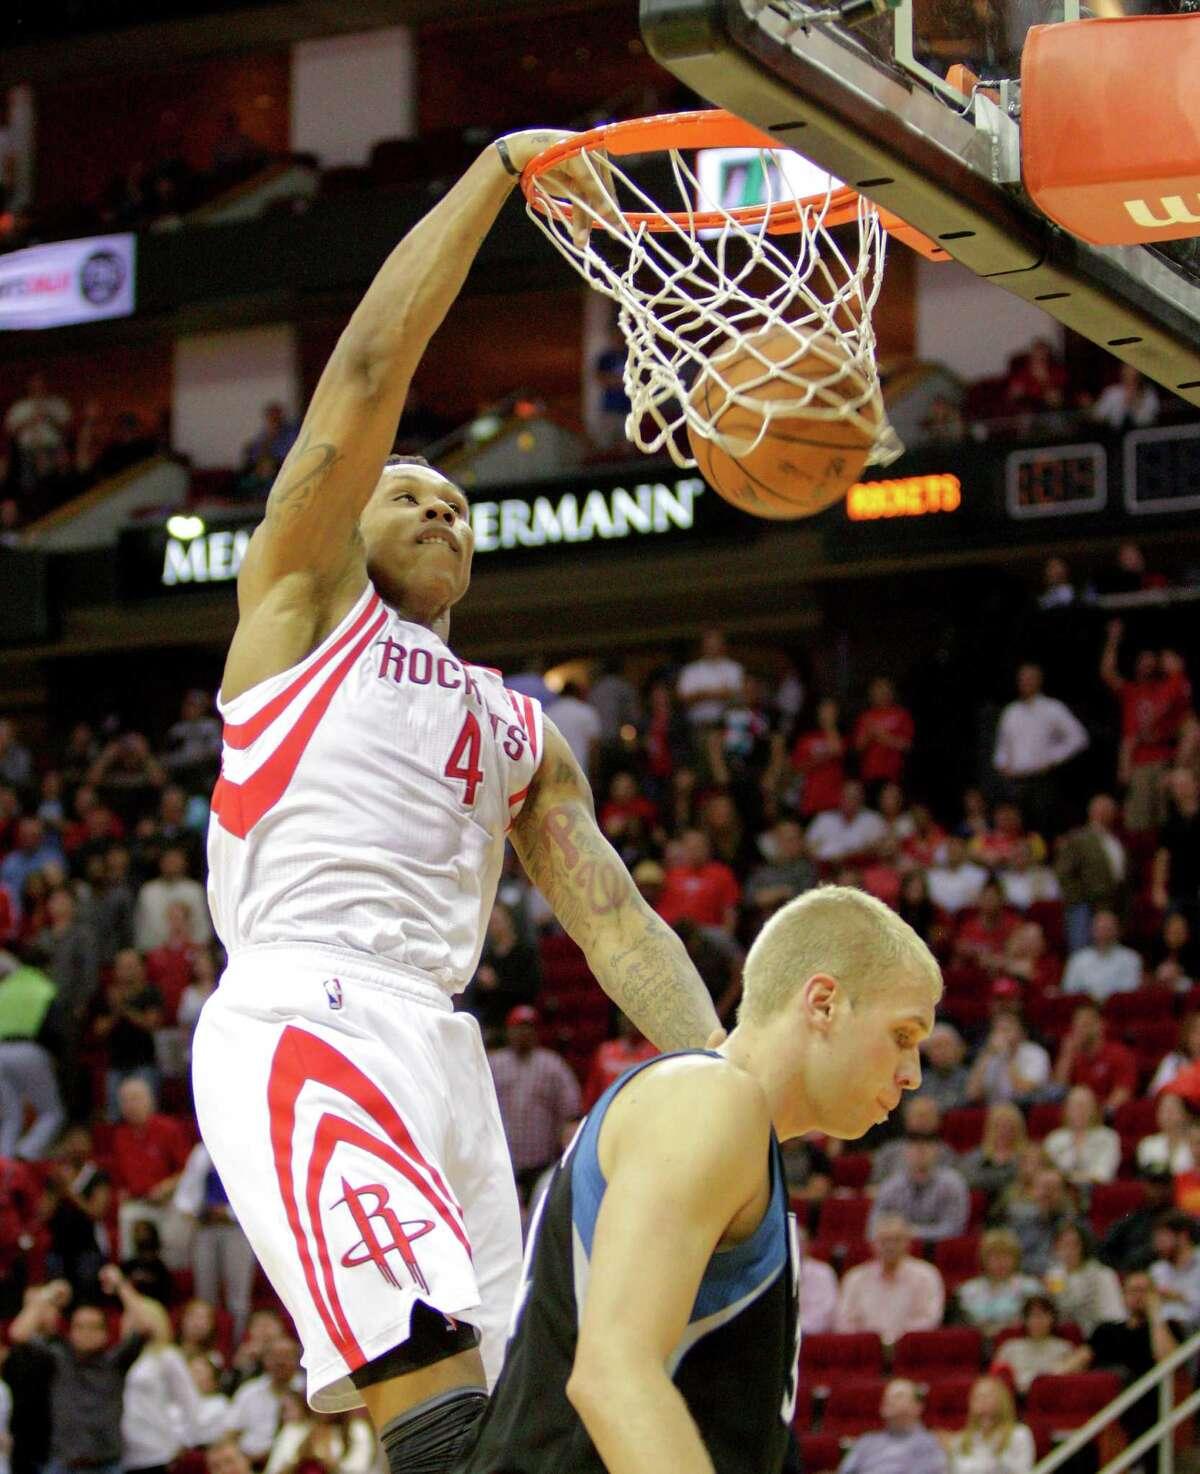 Houston Rockets power forward Greg Smith (4) dunks on Minnesota Timberwolves center Greg Stiemsma (34) during the second half of an NBA basketball game between the Minnesota Timberwolves and the Houston Rockets, Friday, March 15, 2013 in Houston. Houston won 108-100.